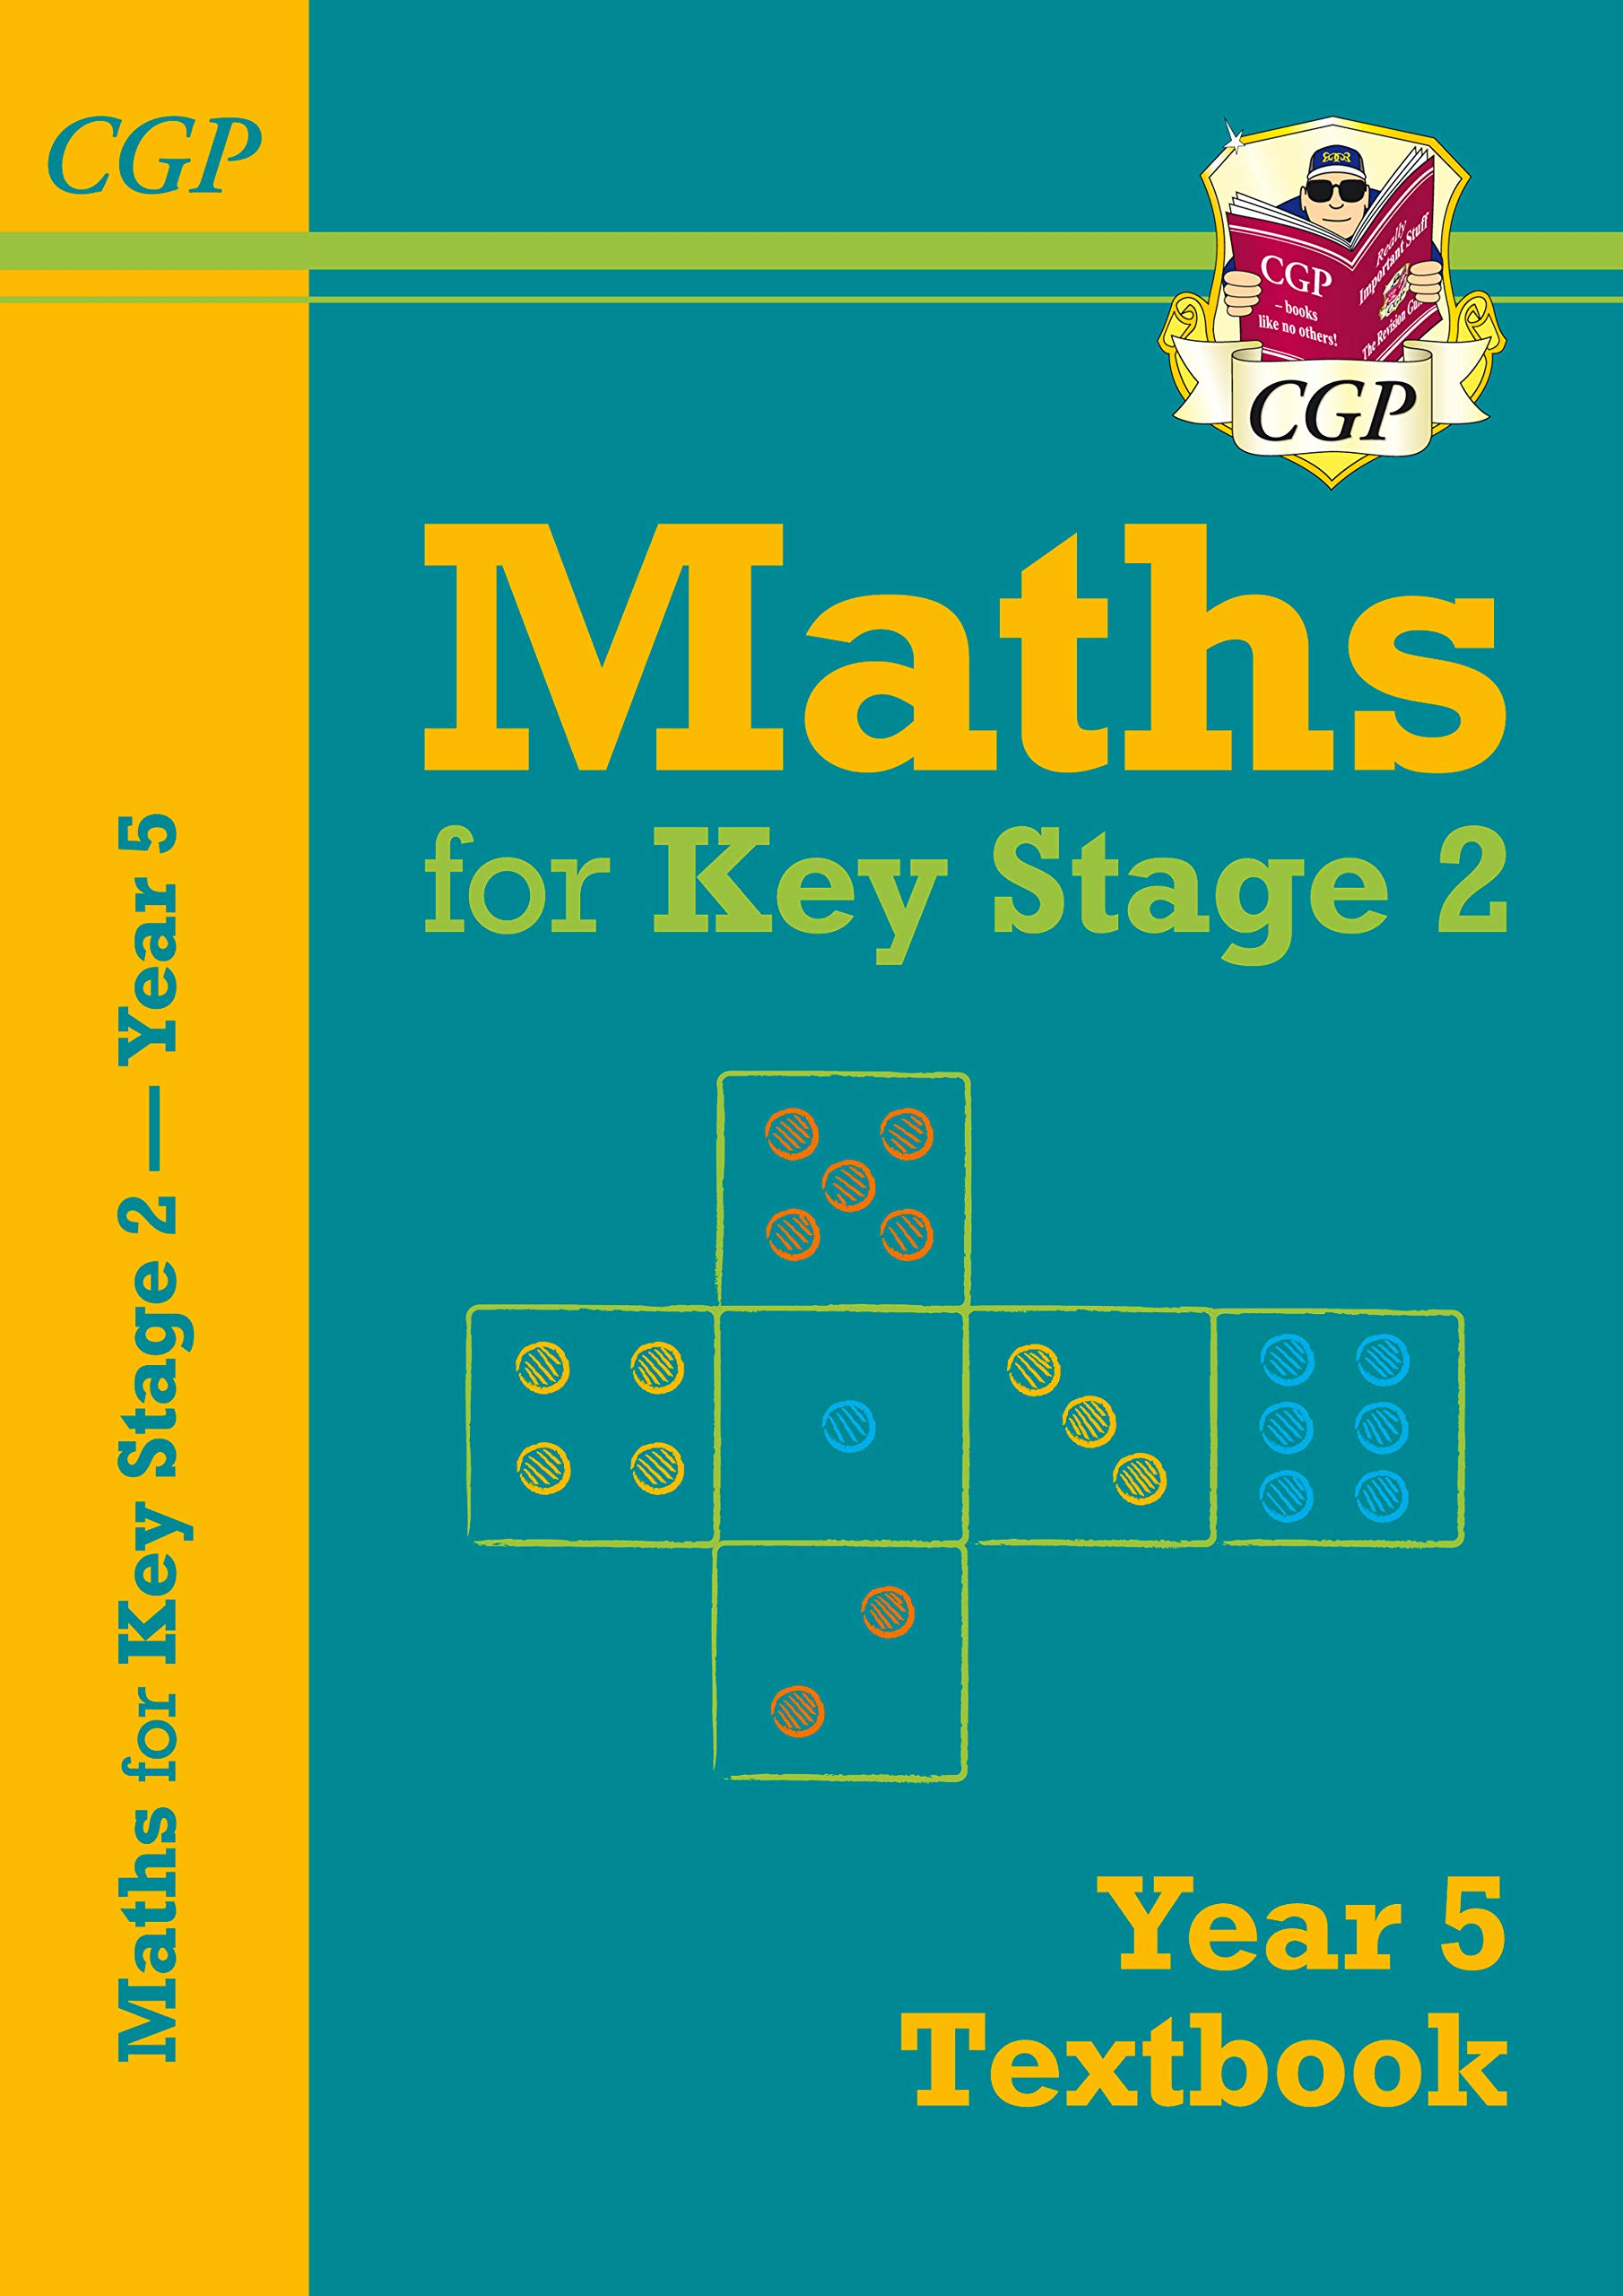 New KS2 Maths Textbook - Year 5 (CGP KS2 Maths): Amazon.co.uk: CGP ...